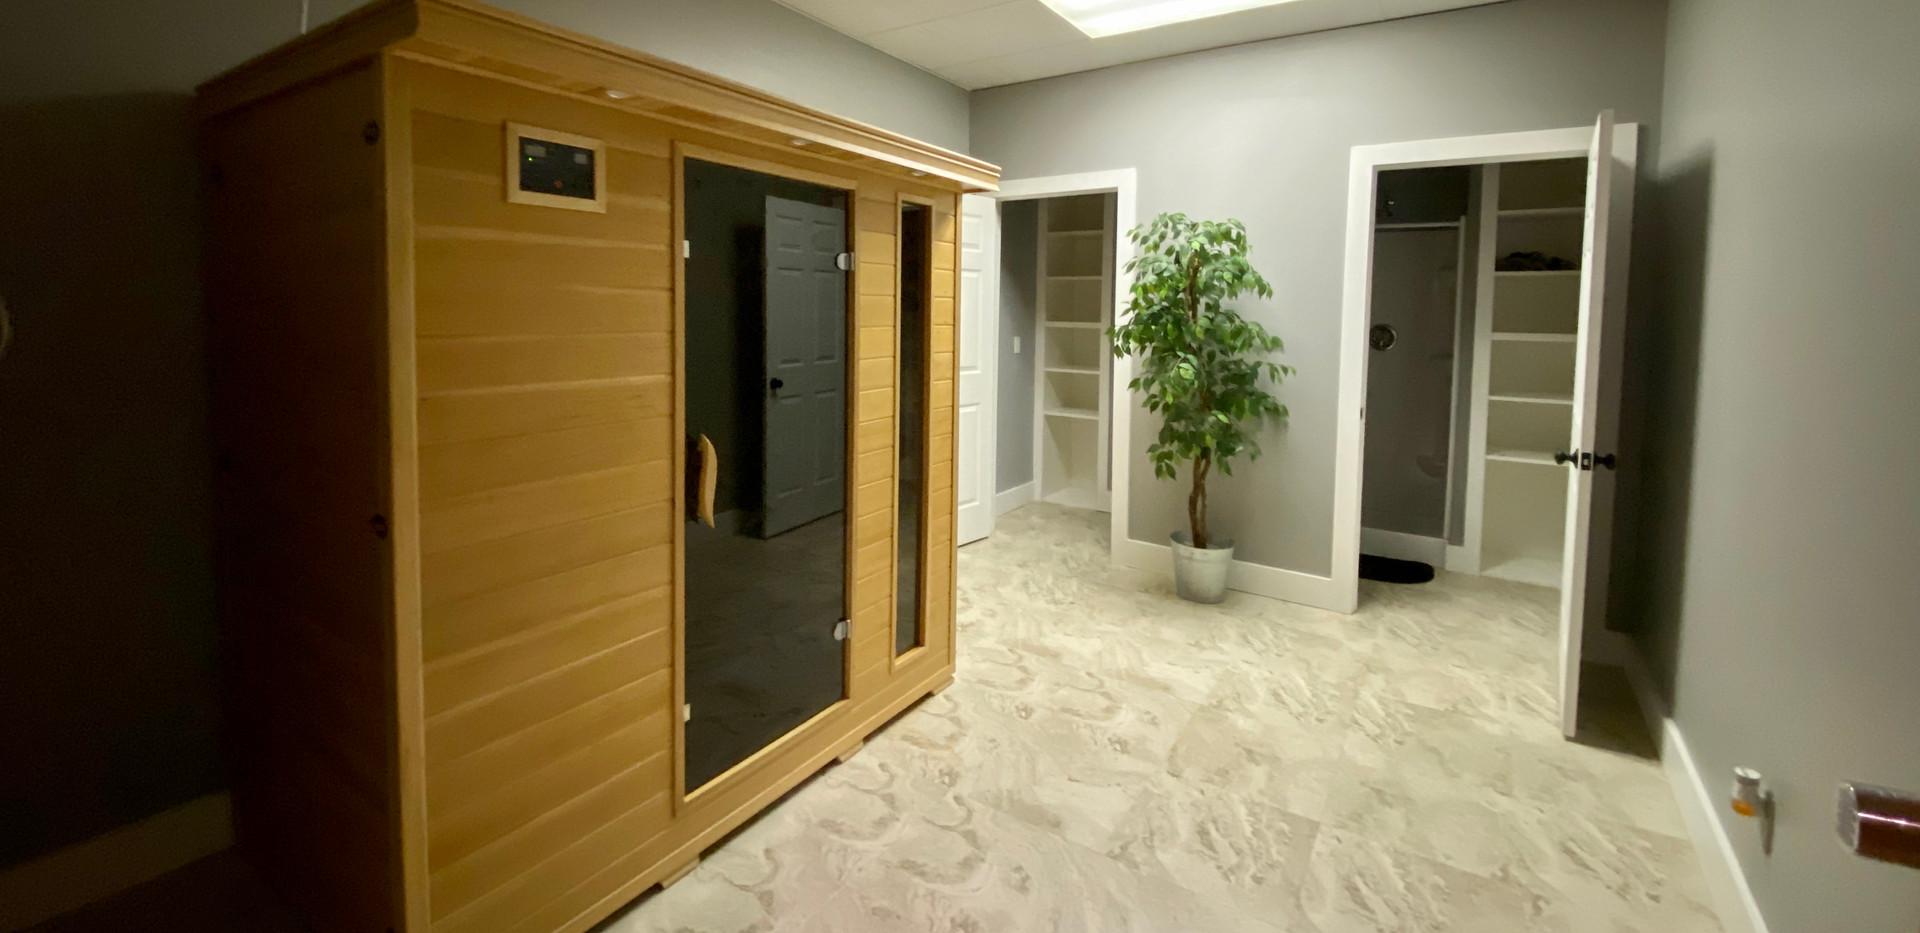 Sauna and Showers